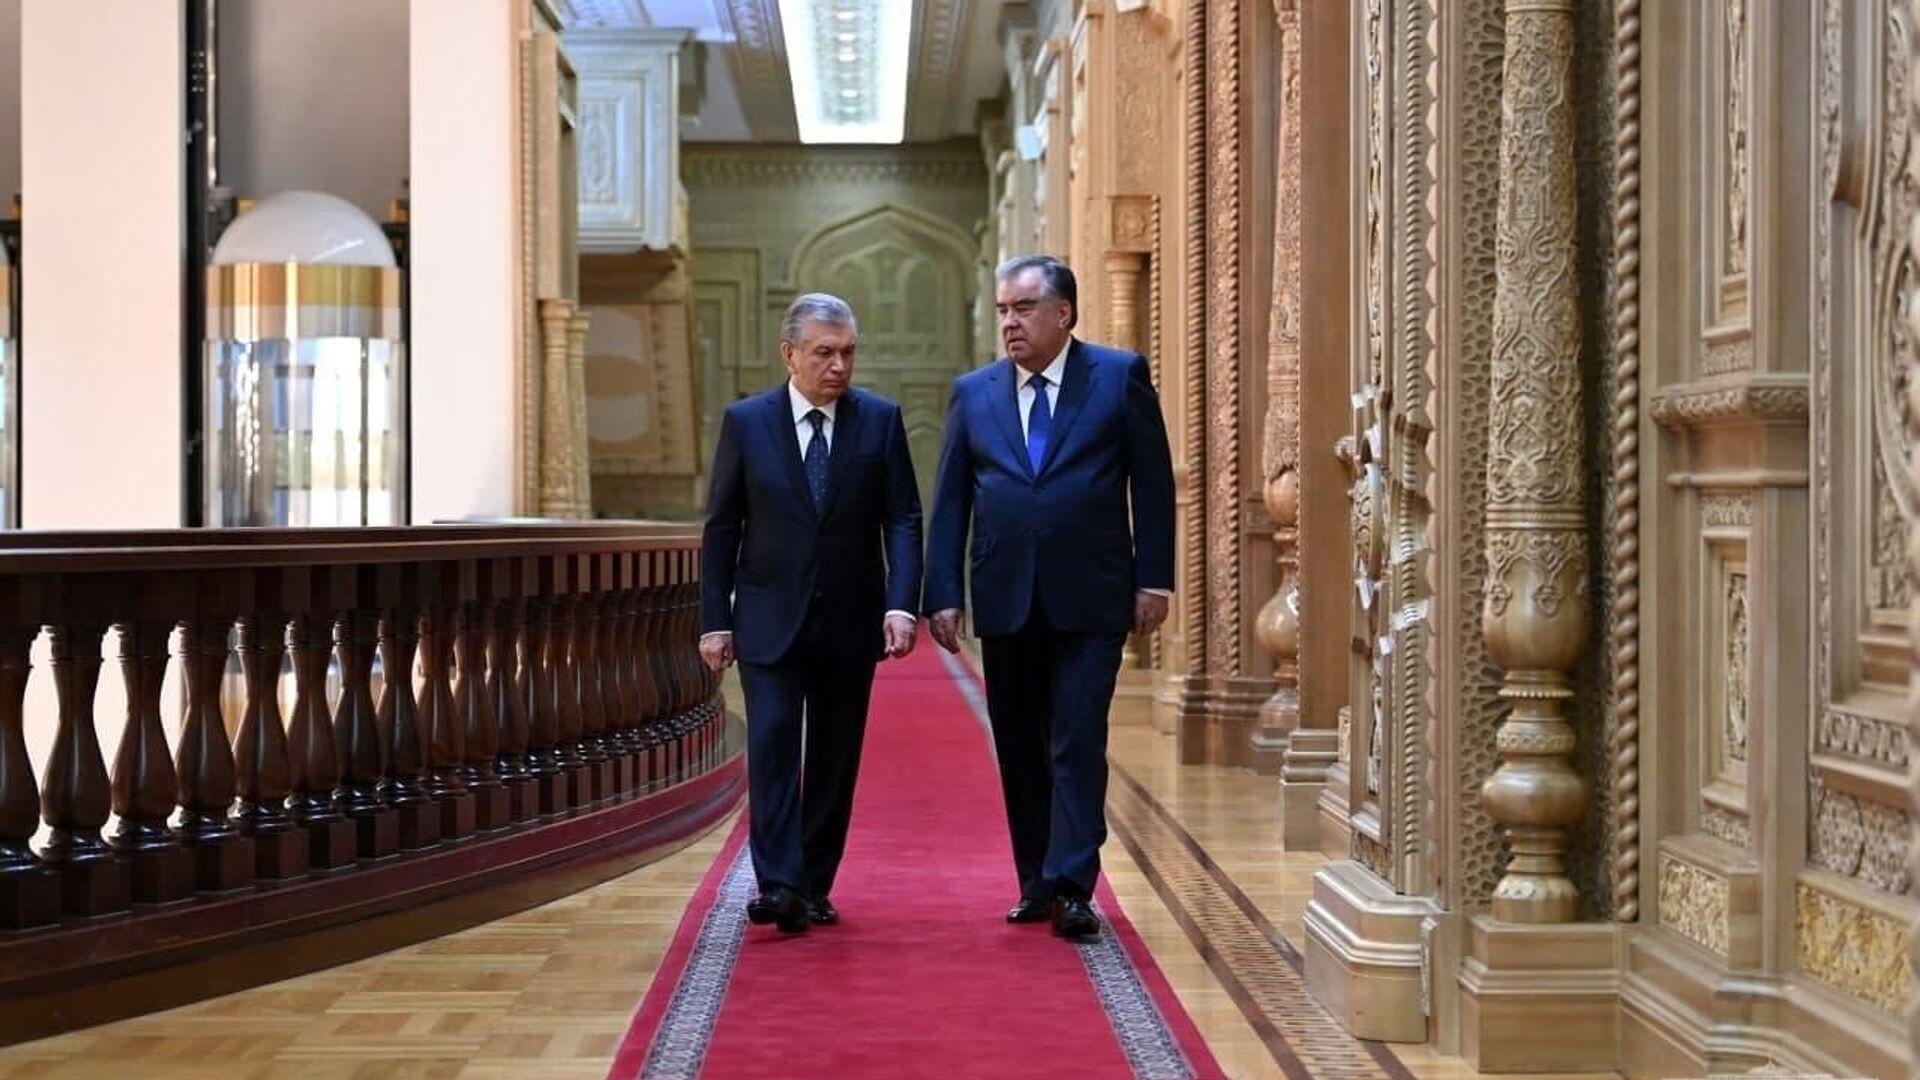 Президент Узбекистана Шавкат Мирзиеев и президент Таджикистана Эмомали Рахмон - Sputnik Таджикистан, 1920, 17.09.2021